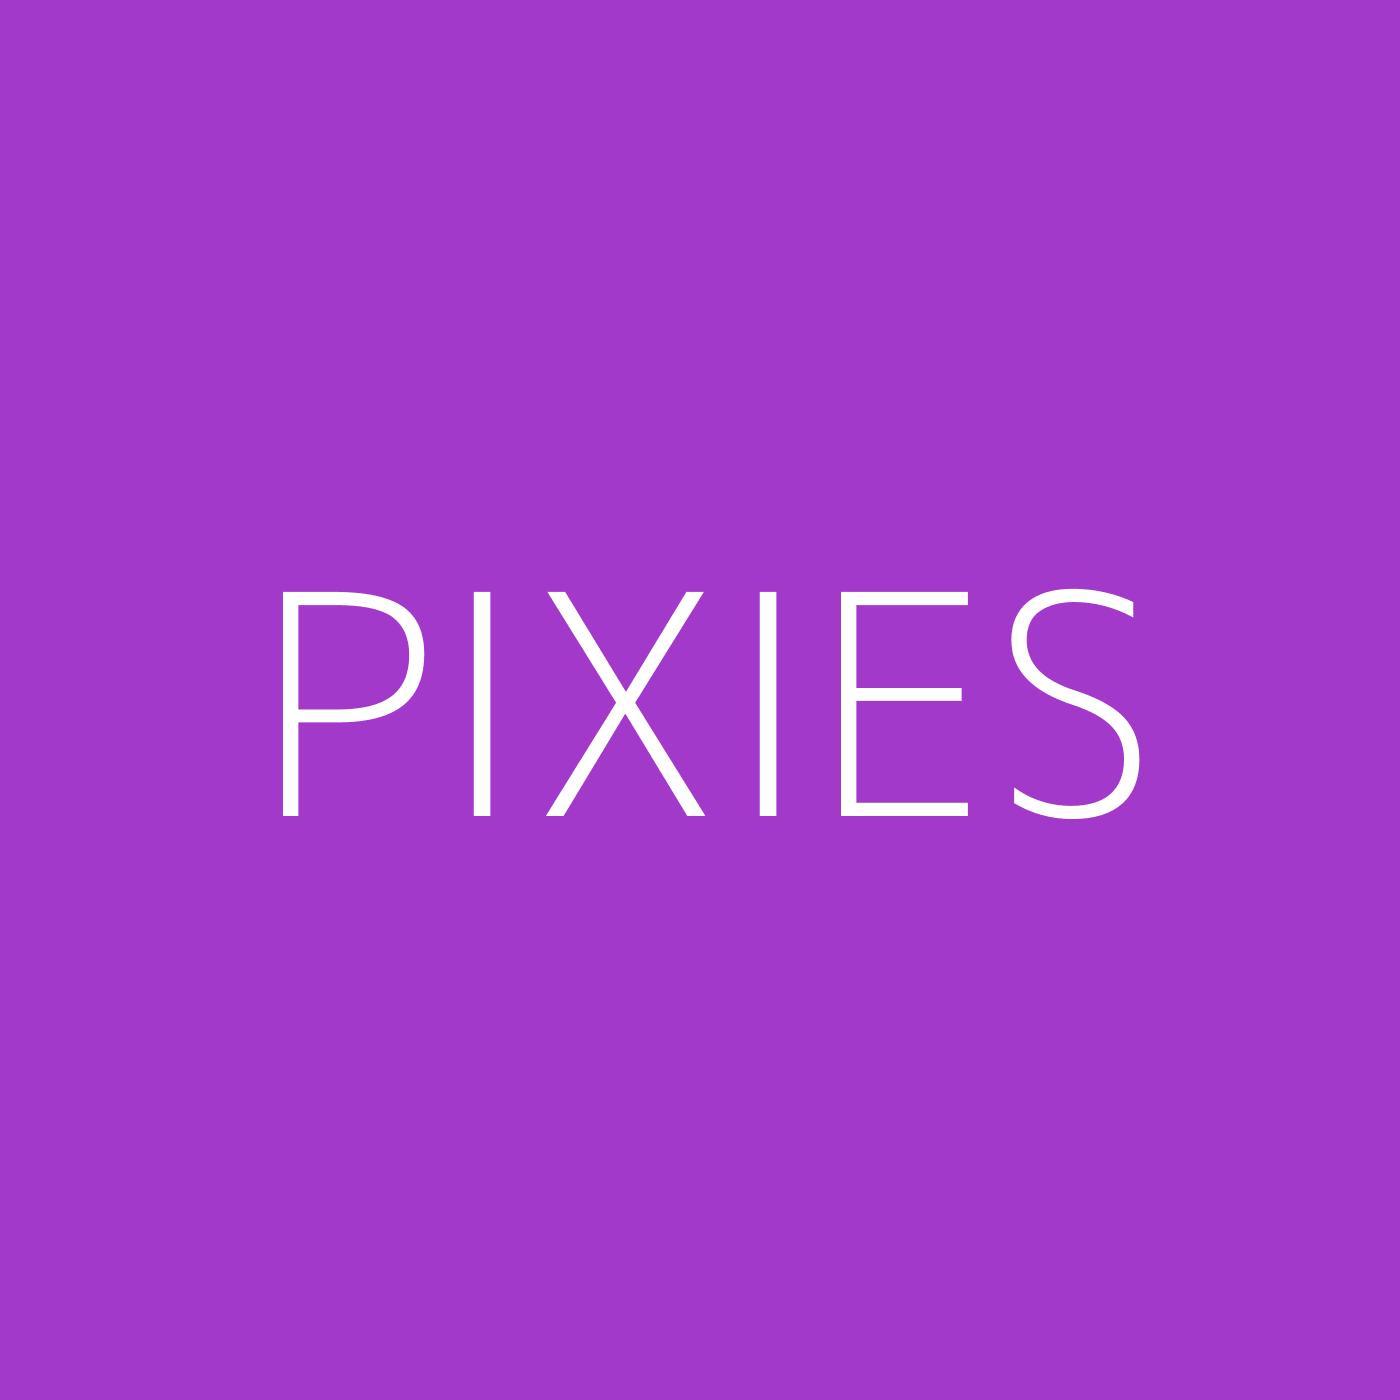 Pixies Playlist Artwork